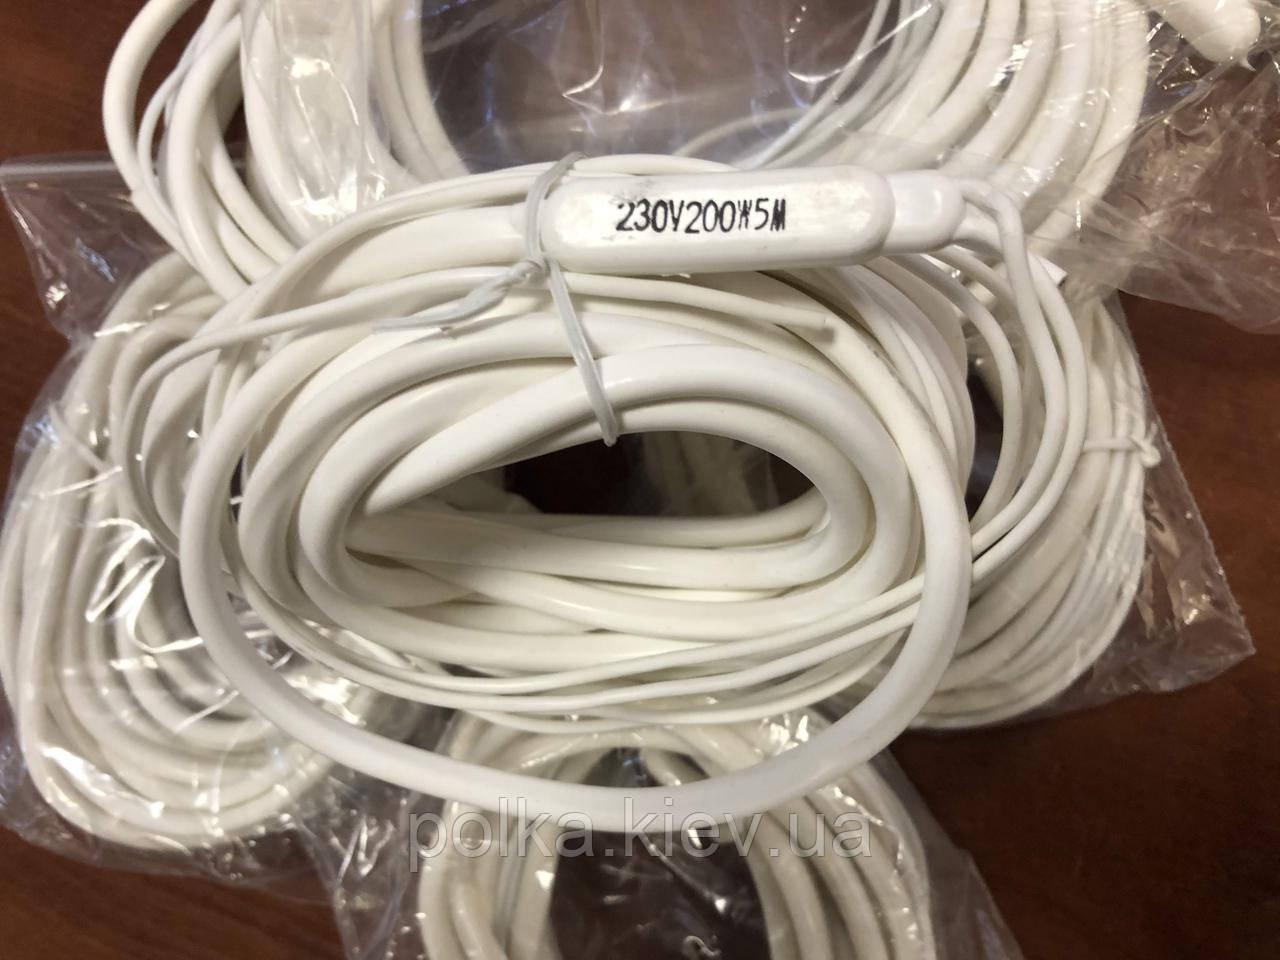 Тэн гибкий 5м 230v 200w (греющий кабель, дренажный)